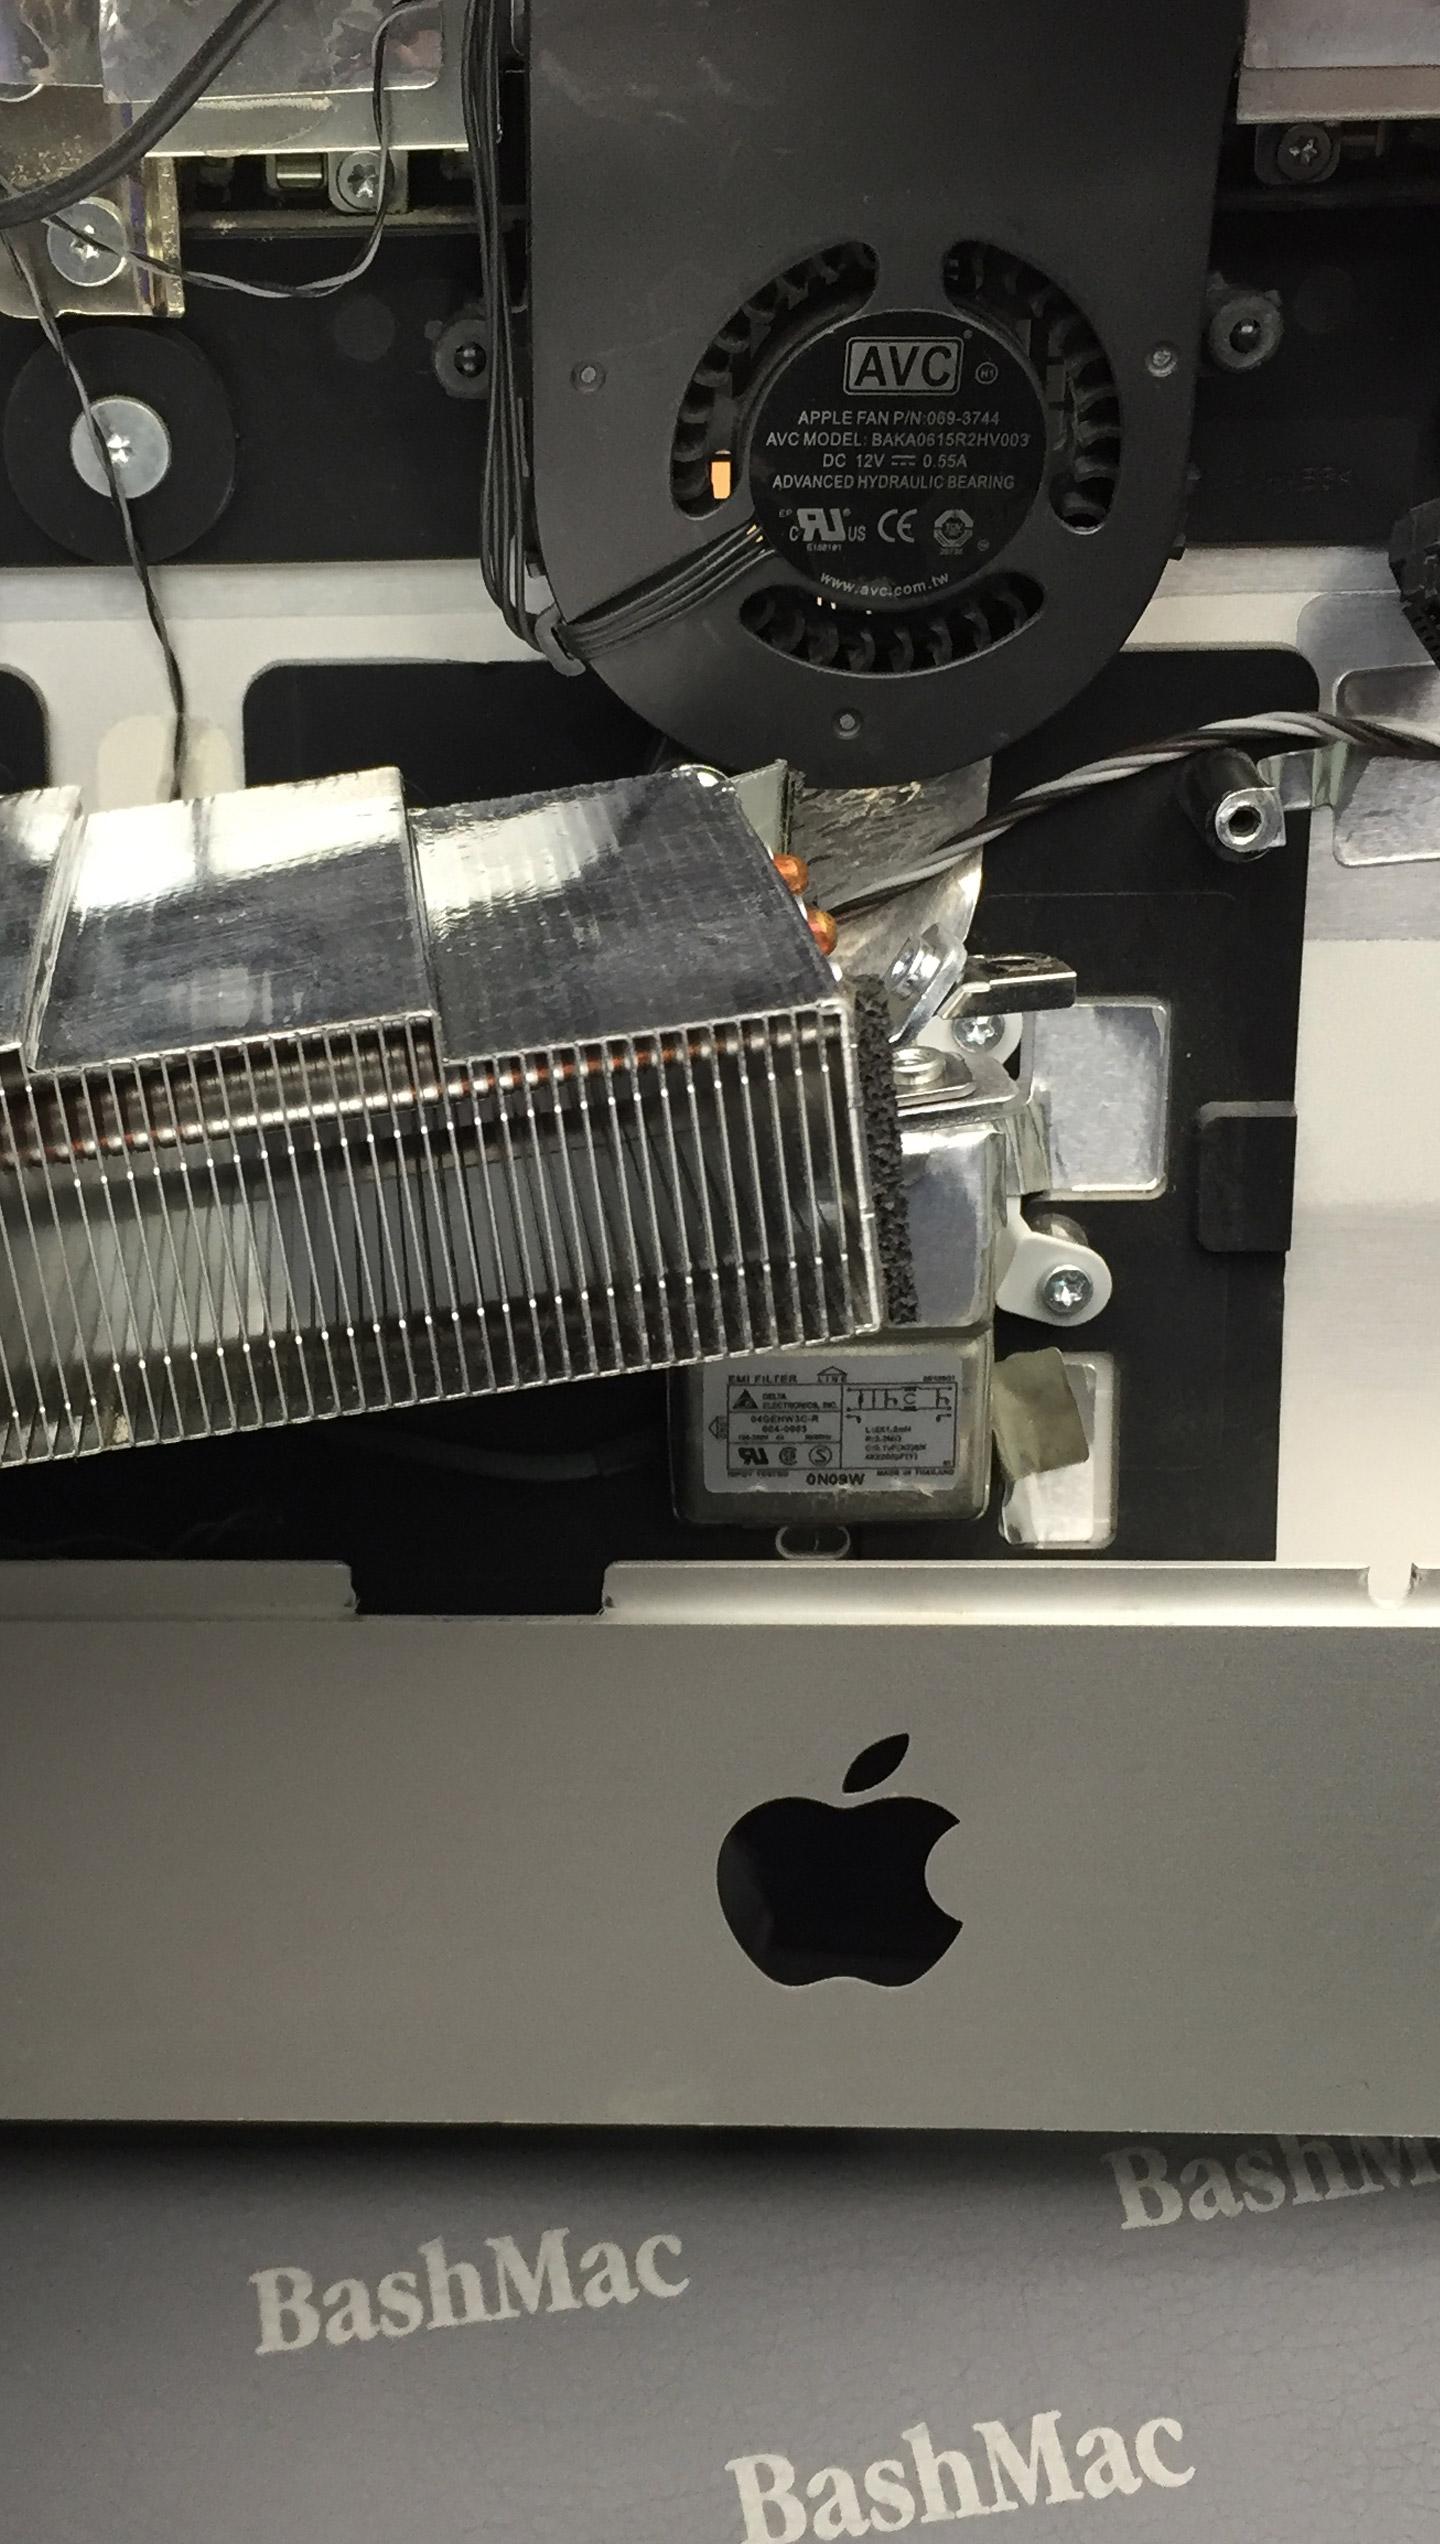 macbook and imac repair bashmac apple service provider. Black Bedroom Furniture Sets. Home Design Ideas